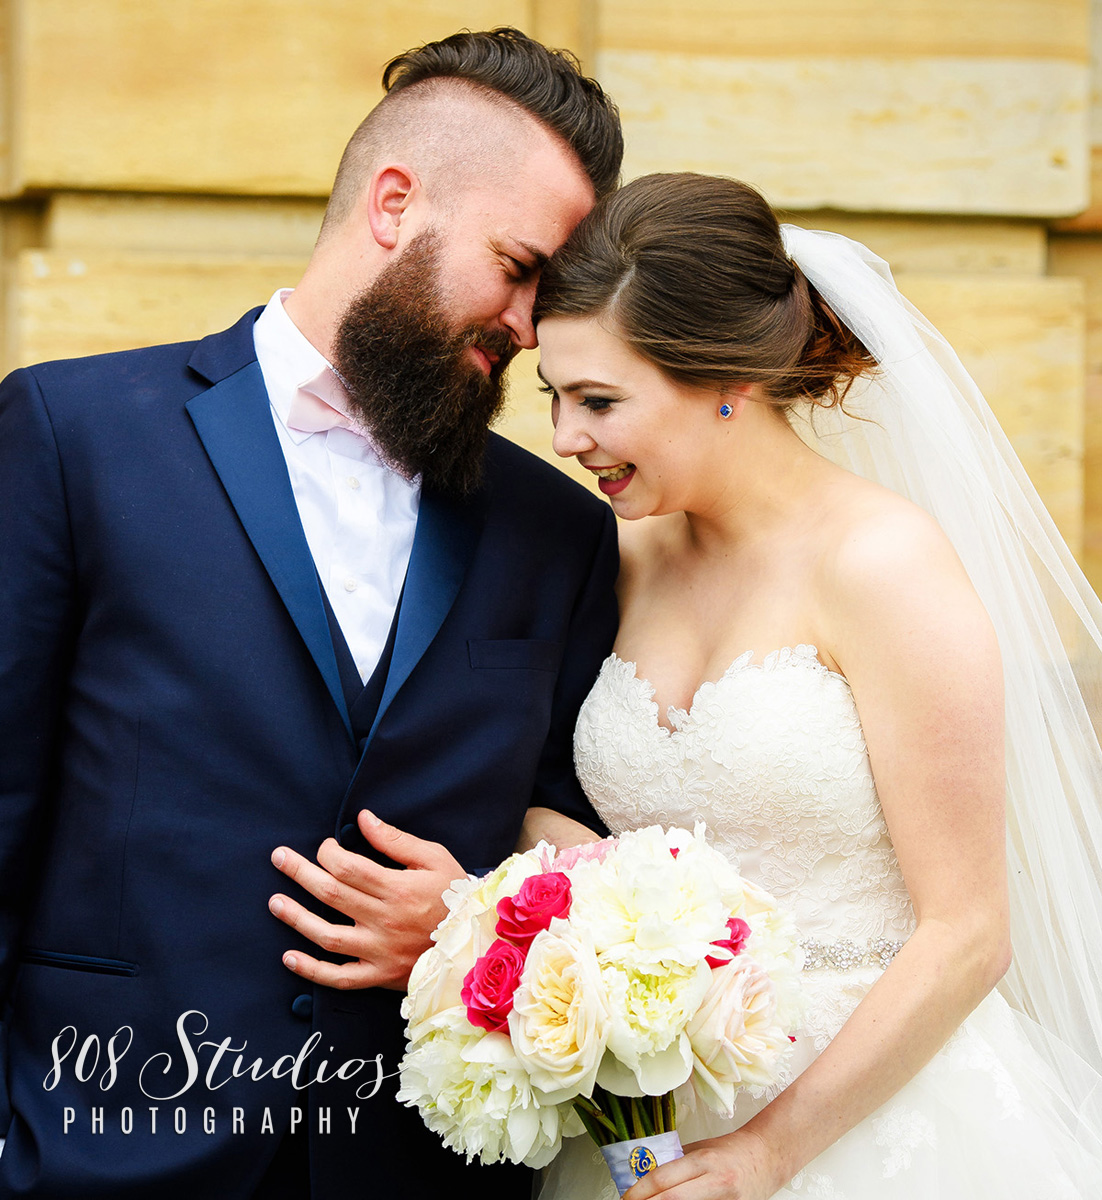 808 STUDIOS Dayton Wedding Photographer photography ohio 315_6693